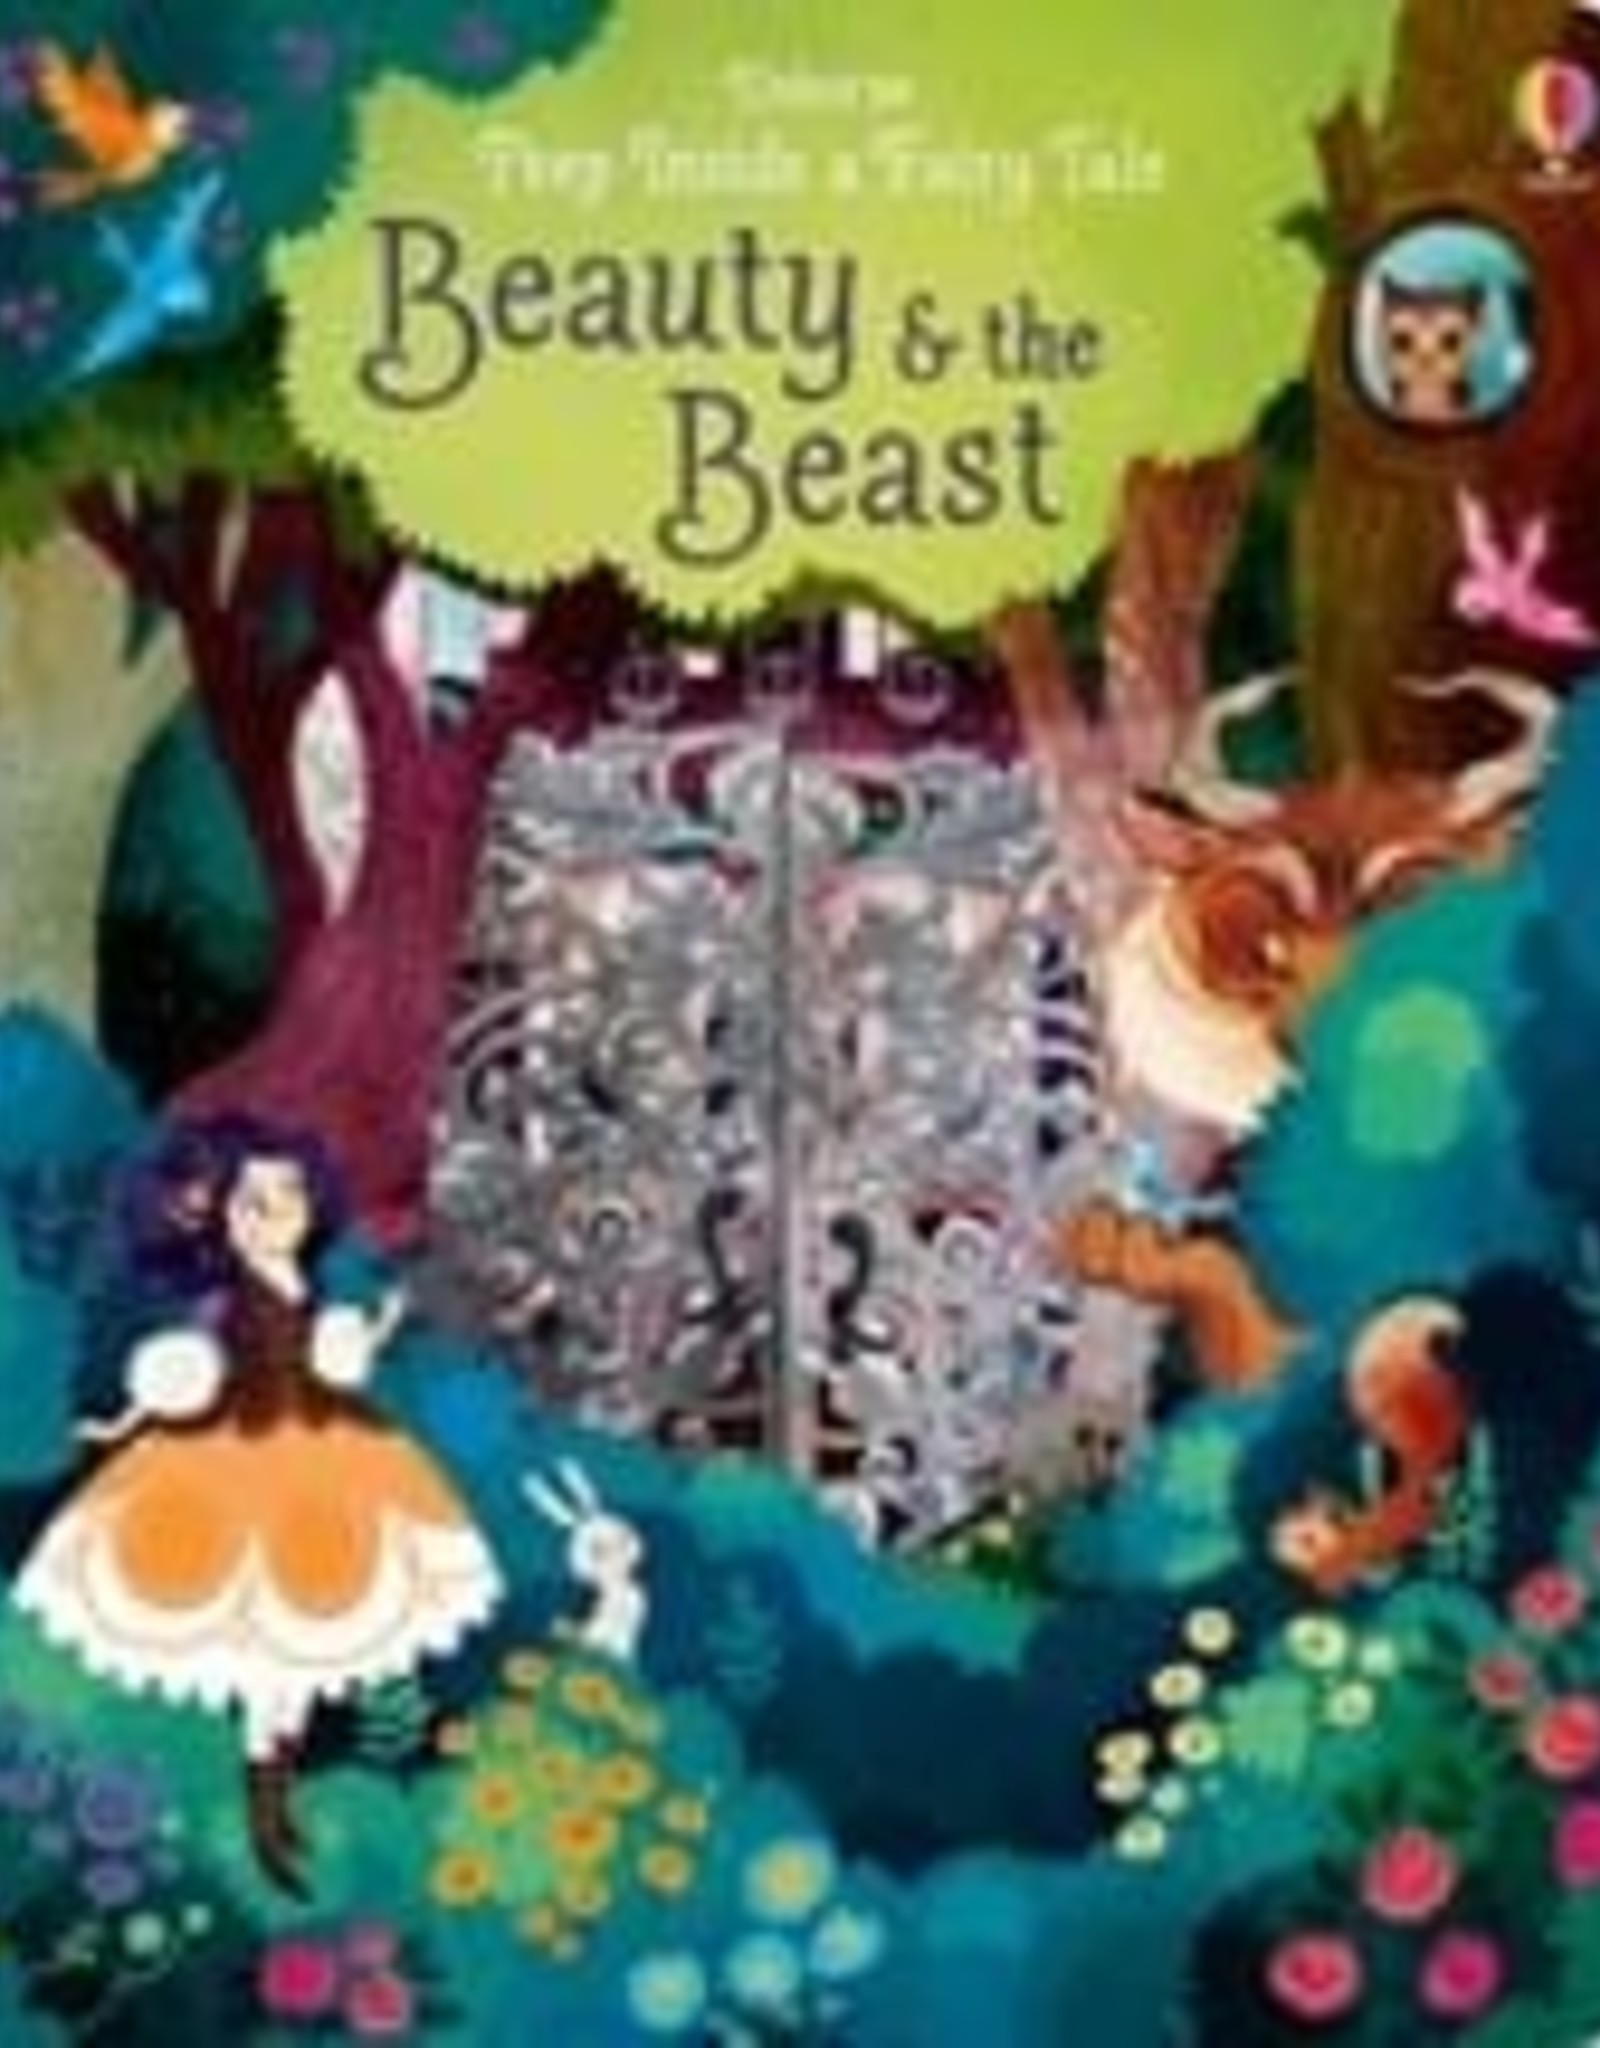 EDC Peek Inside a Fairytale Beauty and the Beast